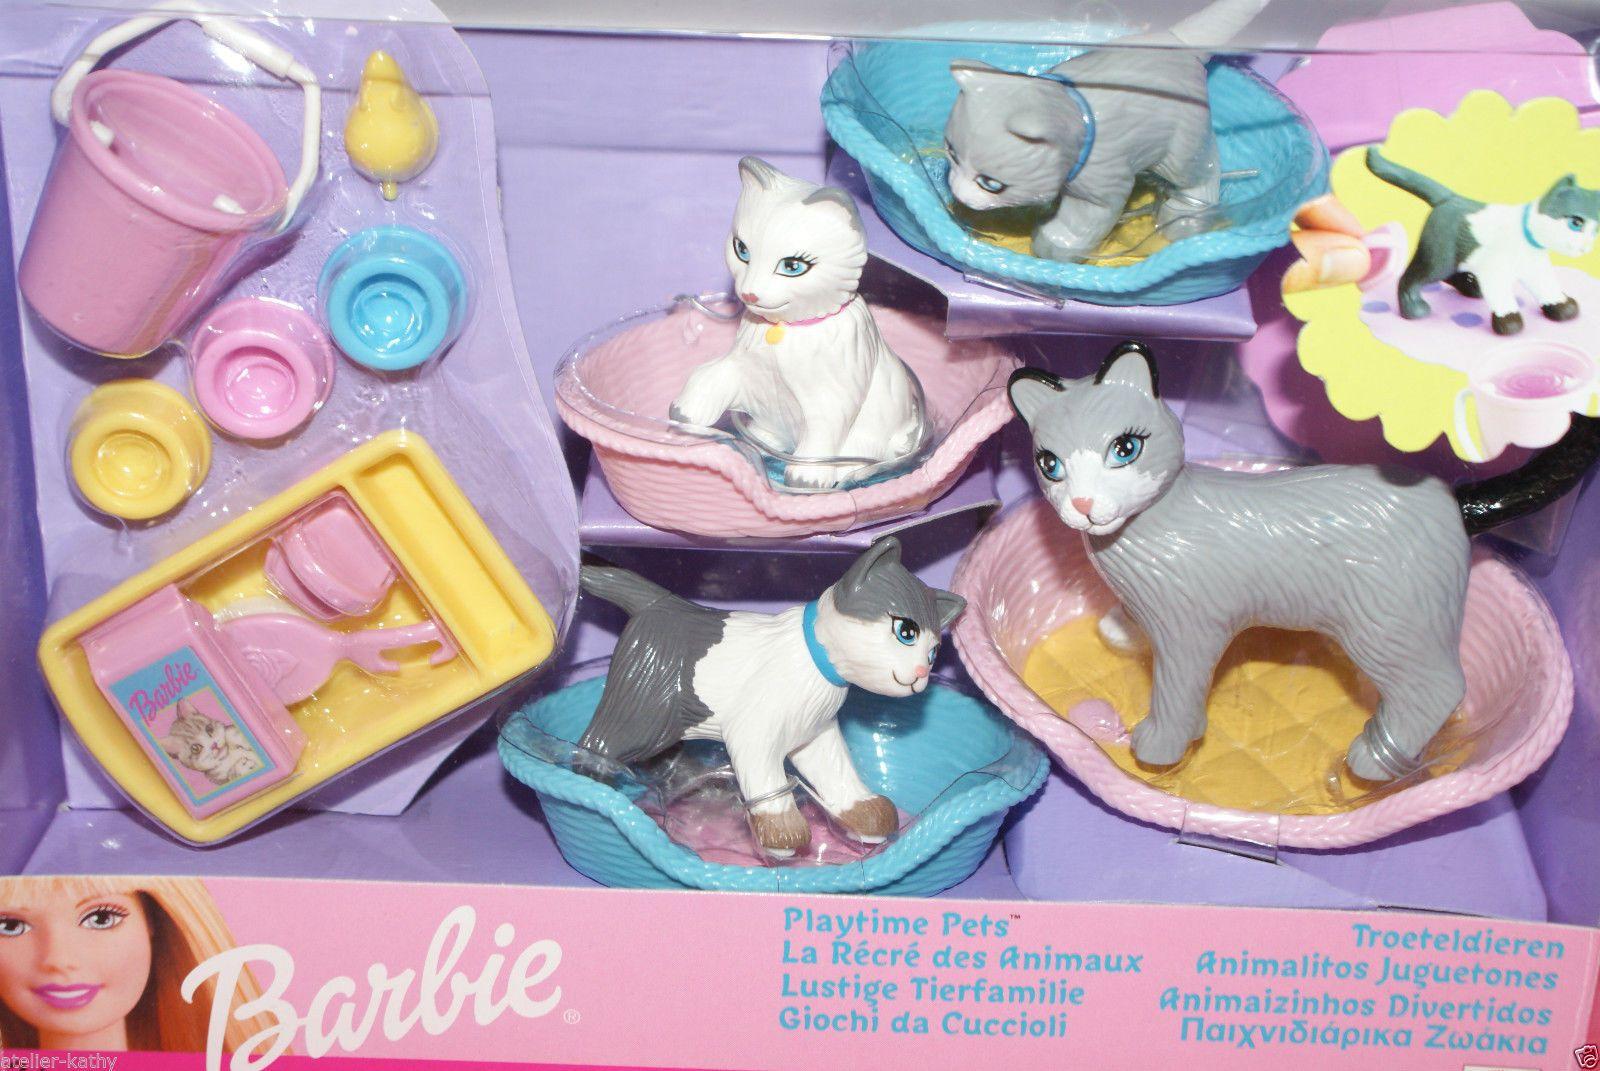 Barbie Playtime Pets Poezen Cats Nrfb Ebay Barbie Dog Barbie Toys Barbie Doll Set